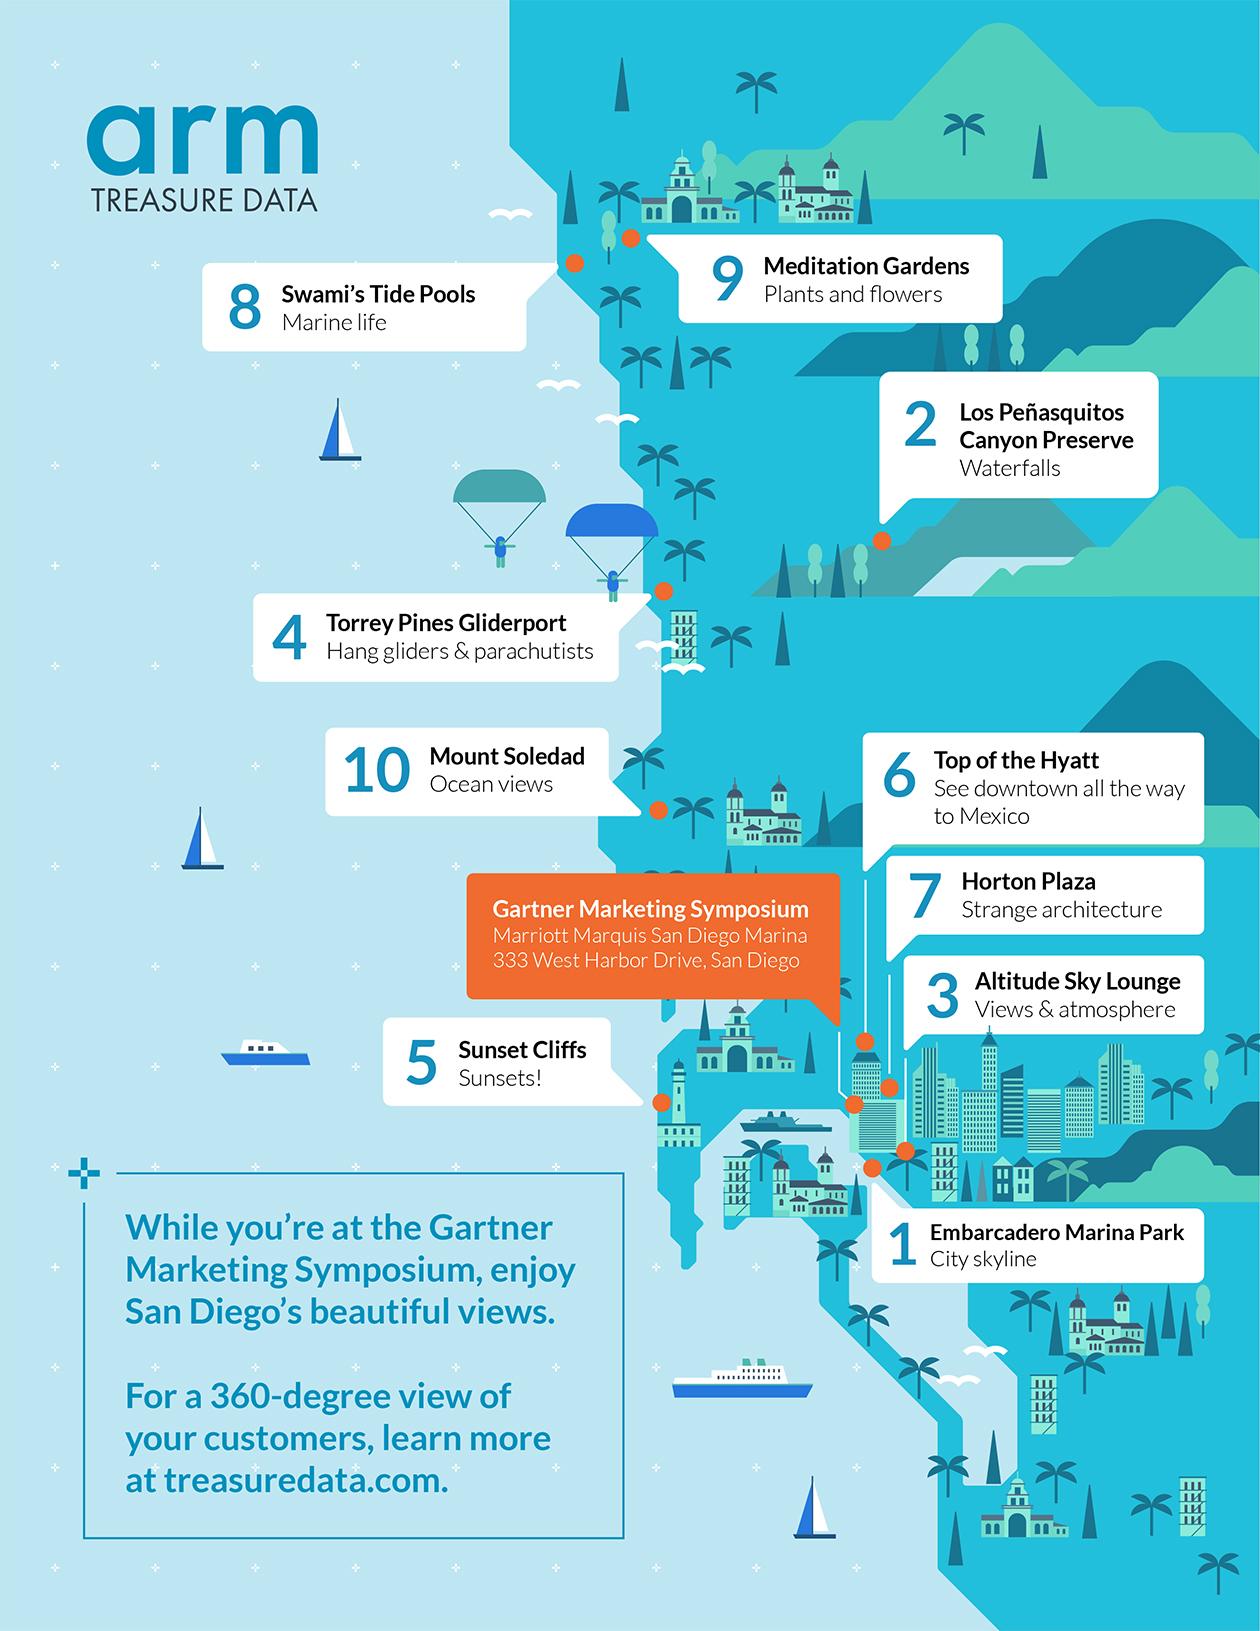 10 Beautiful Views to Enjoy at the Gartner Marketing Symposium